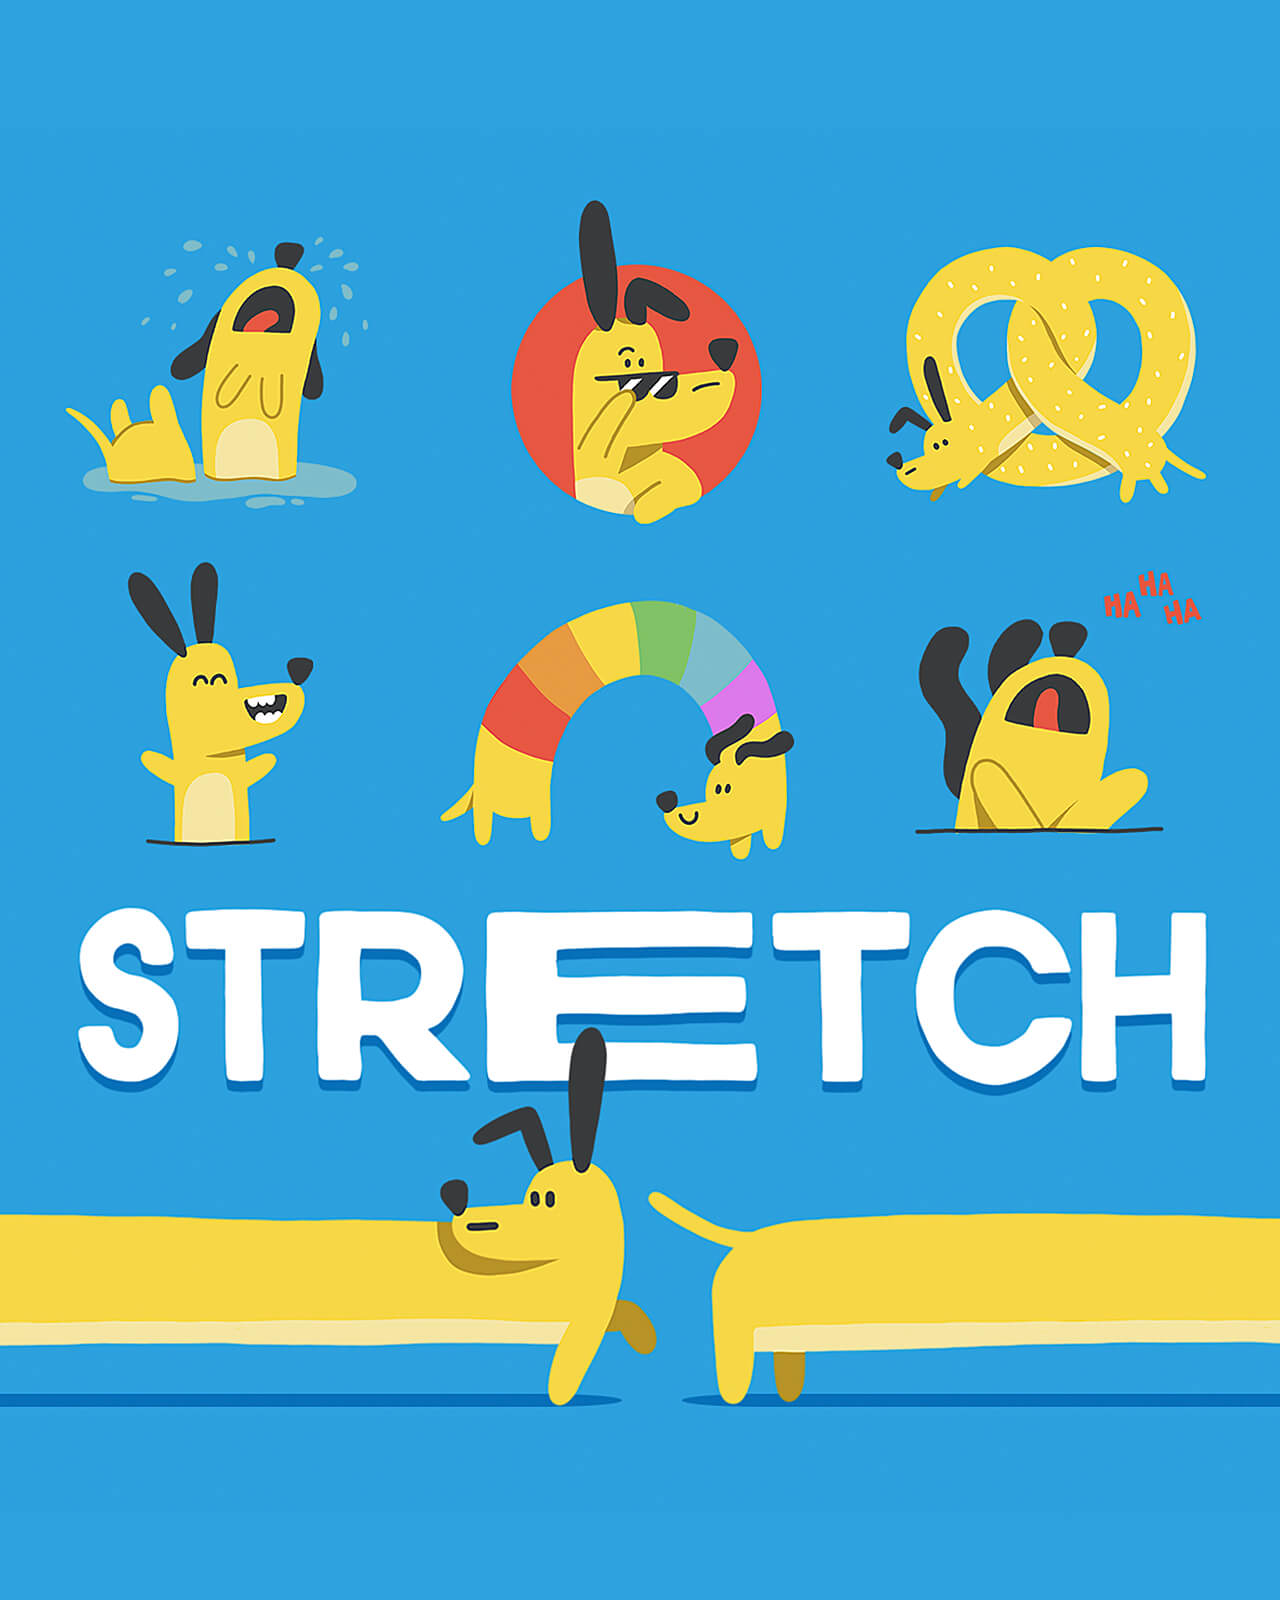 Stretch, The Dog